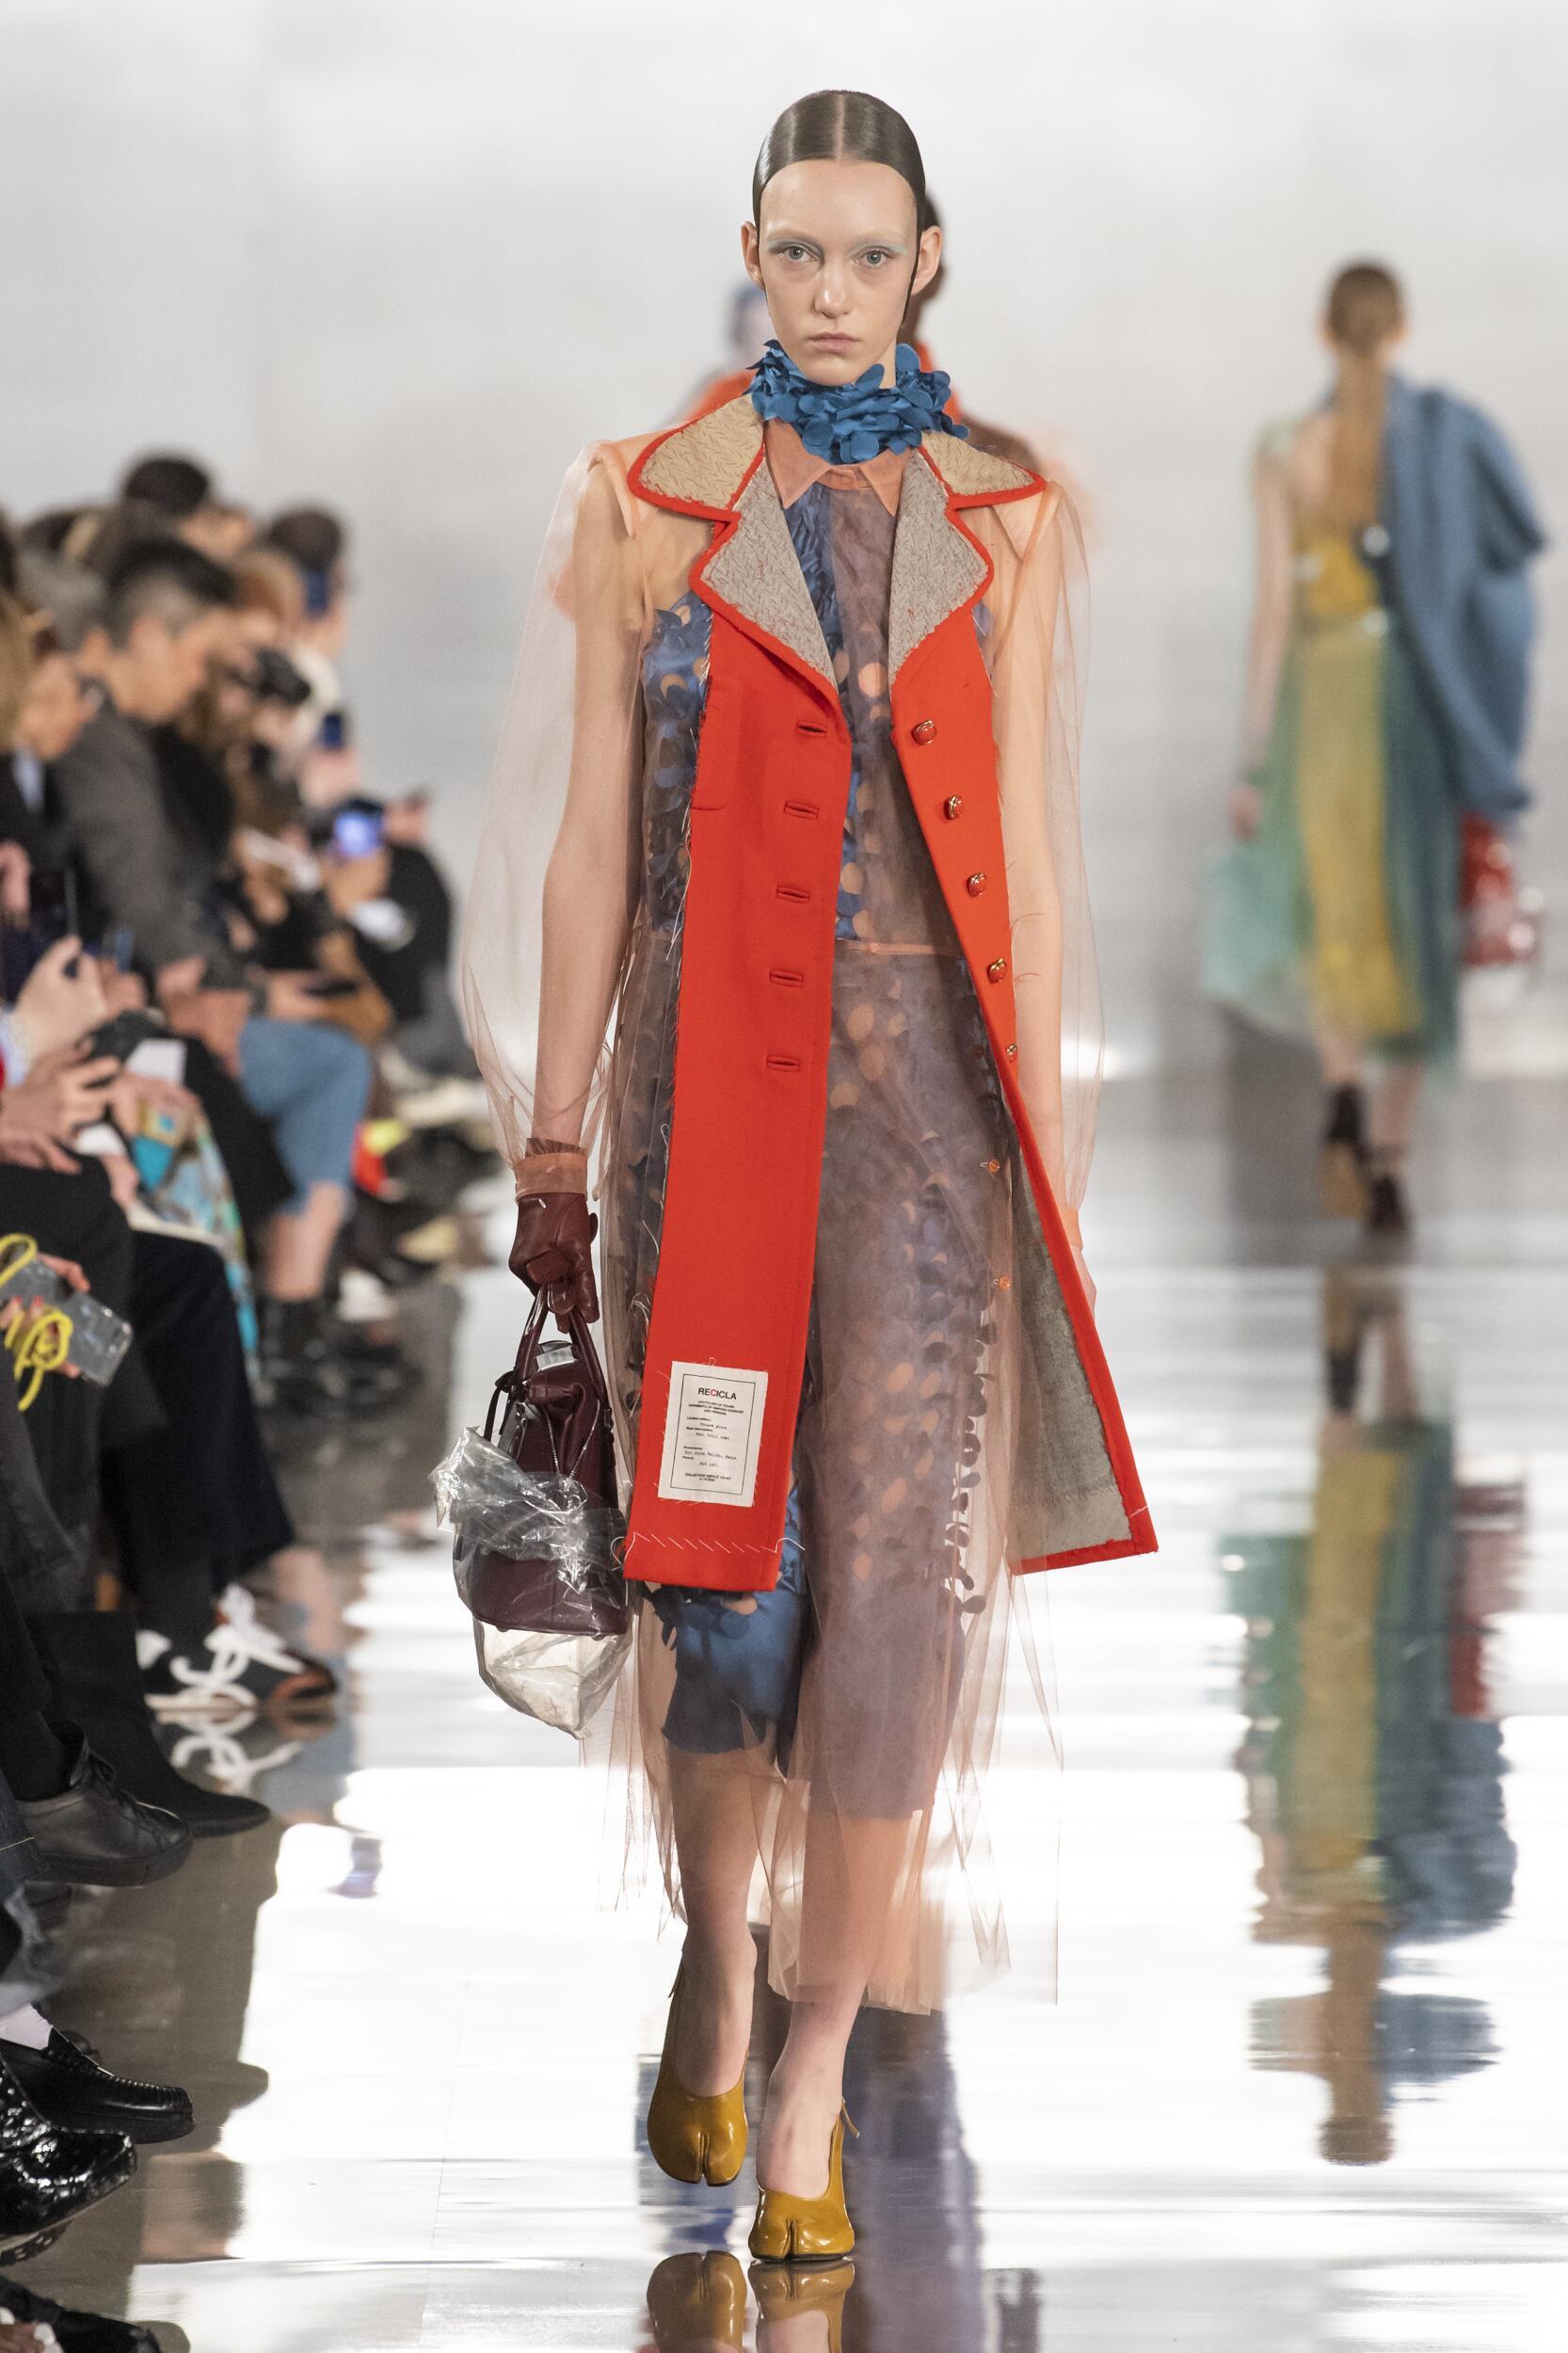 Model Fashion Show Maison Margiela